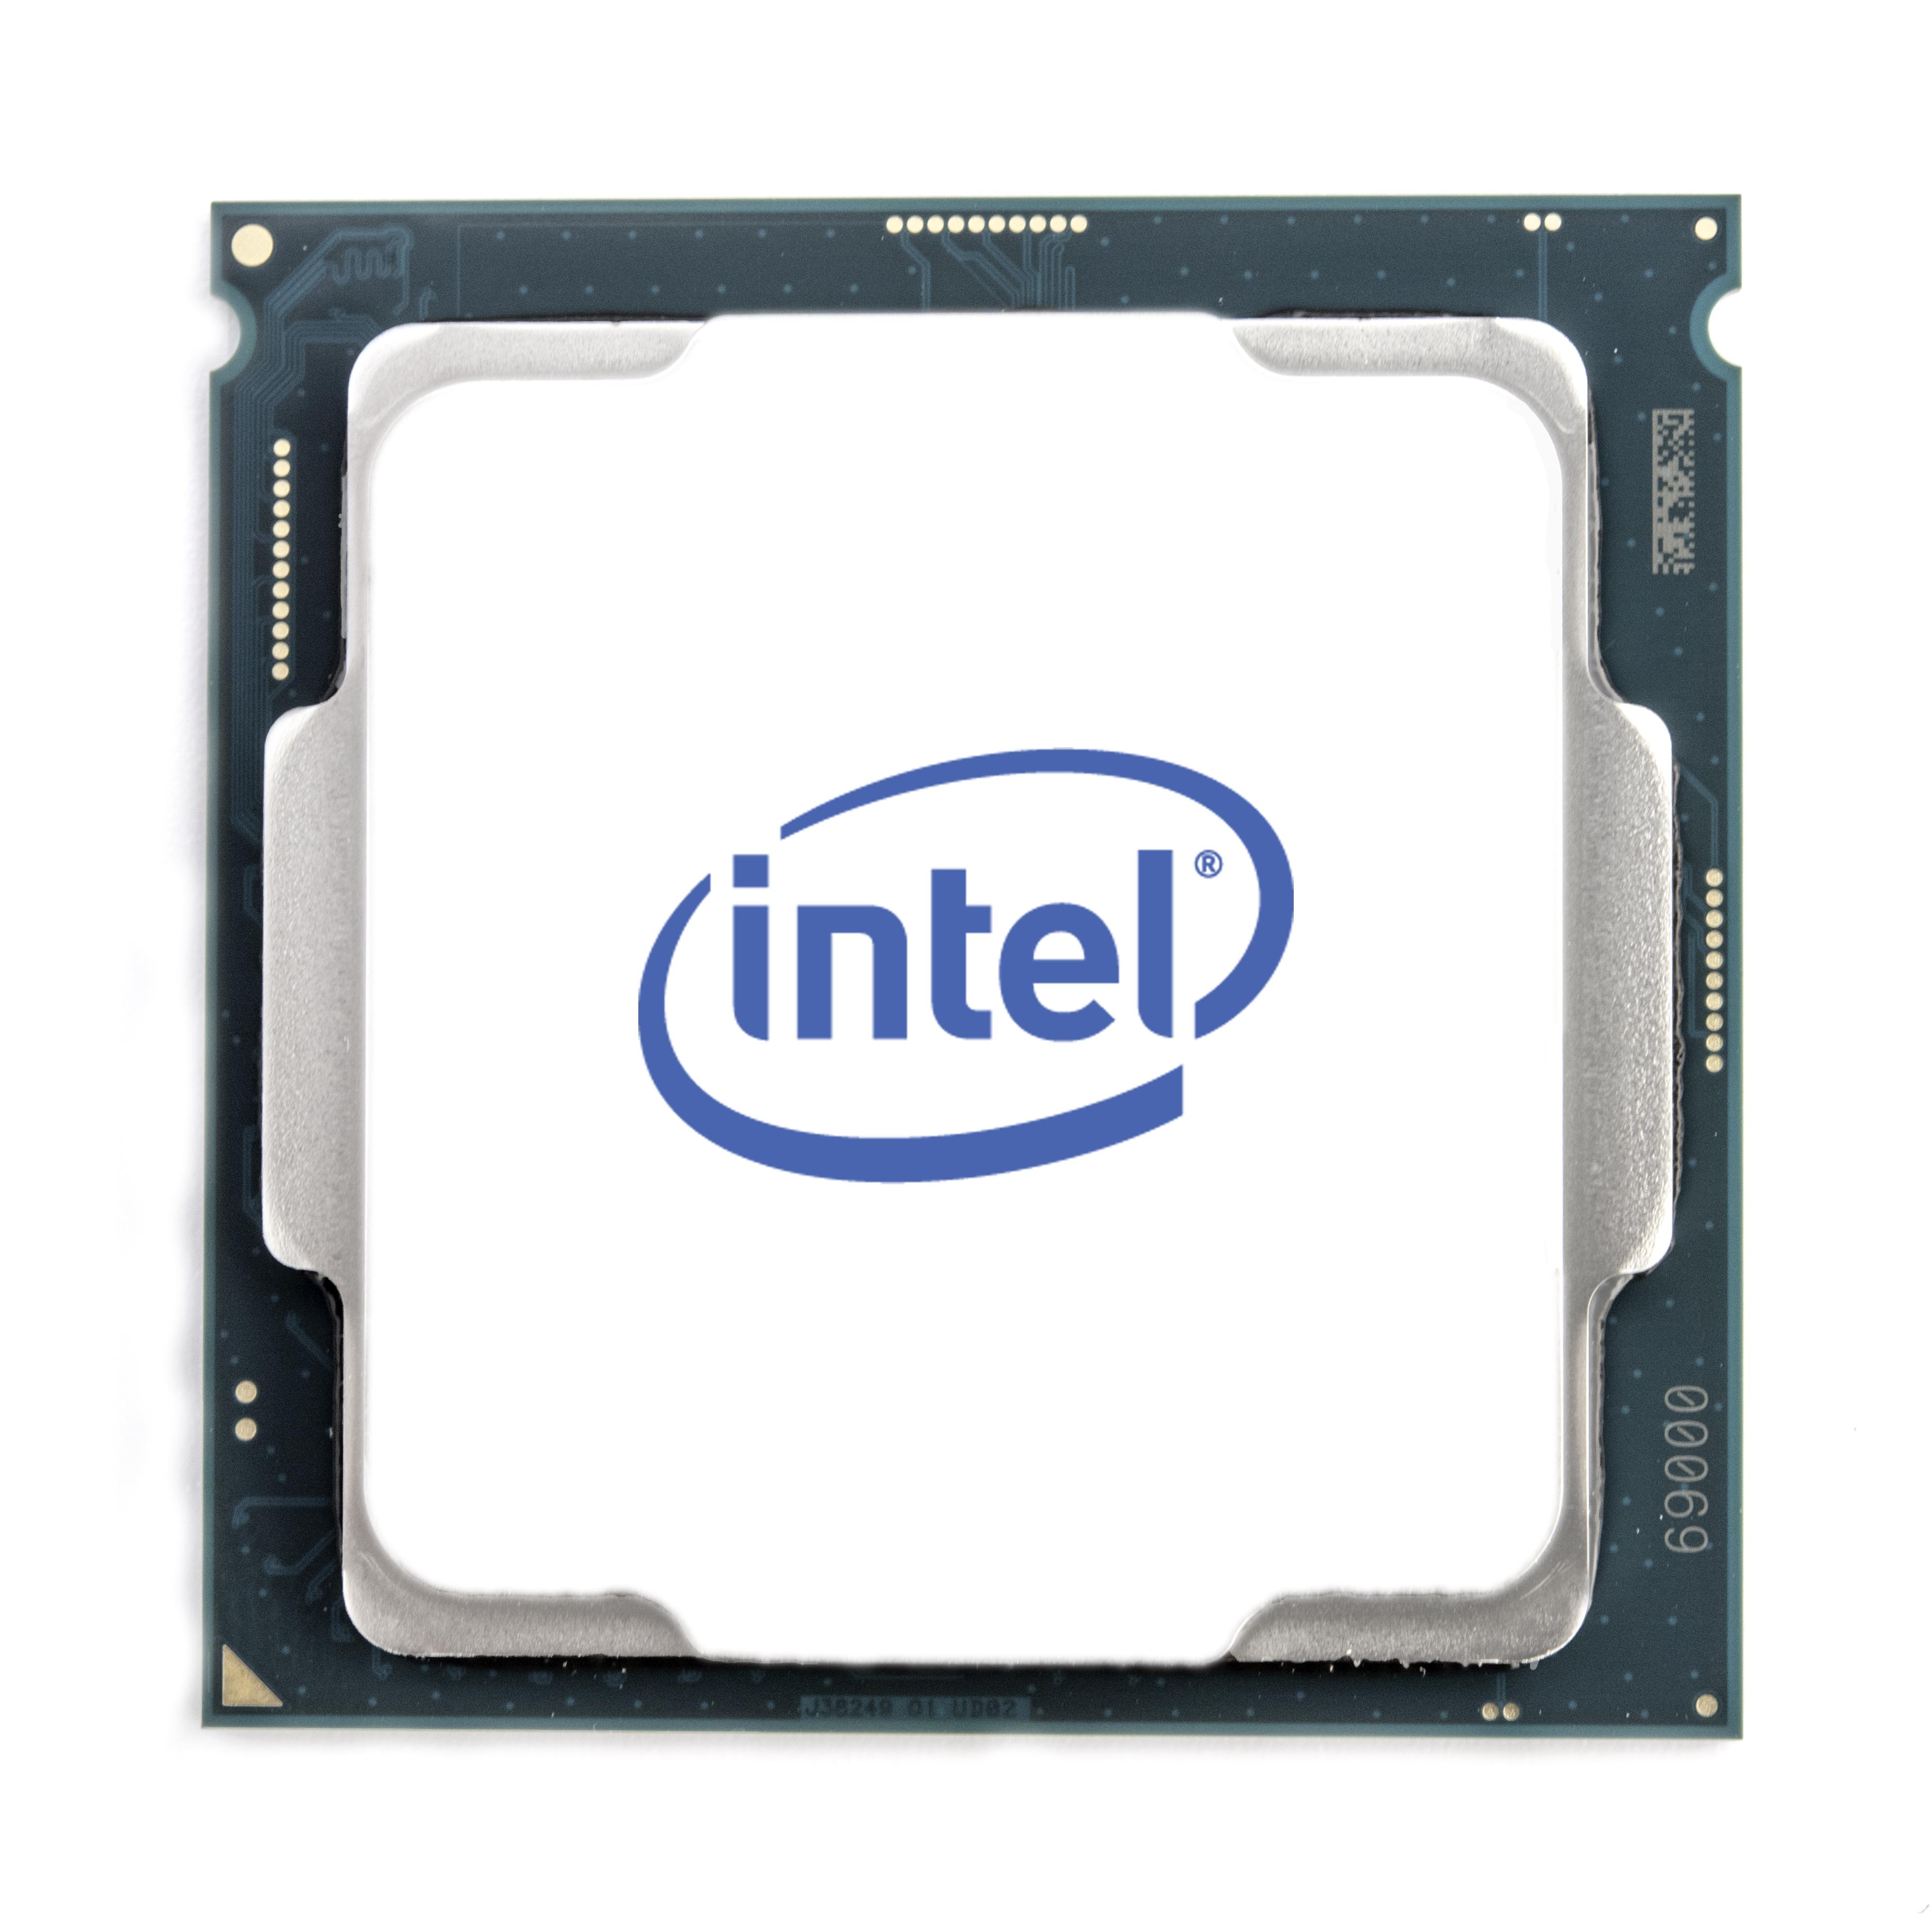 Cpu intel i7-9700 3,0ghz skt1151 8core 12mb cache